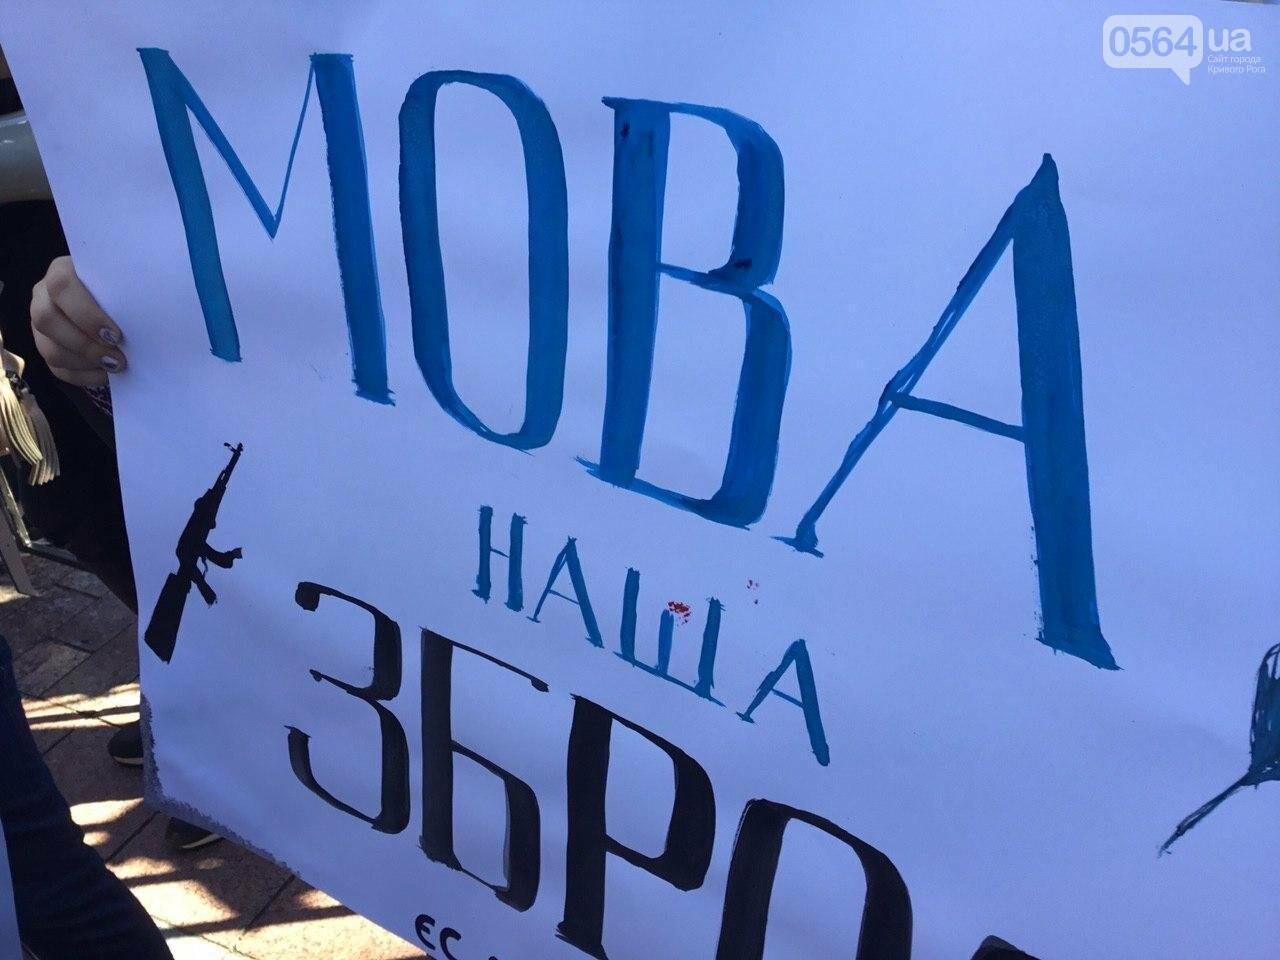 """Руки геть від мови"": под стенами Верховной рады проходит акция протеста, - ФОТО, ВИДЕО, фото-26"